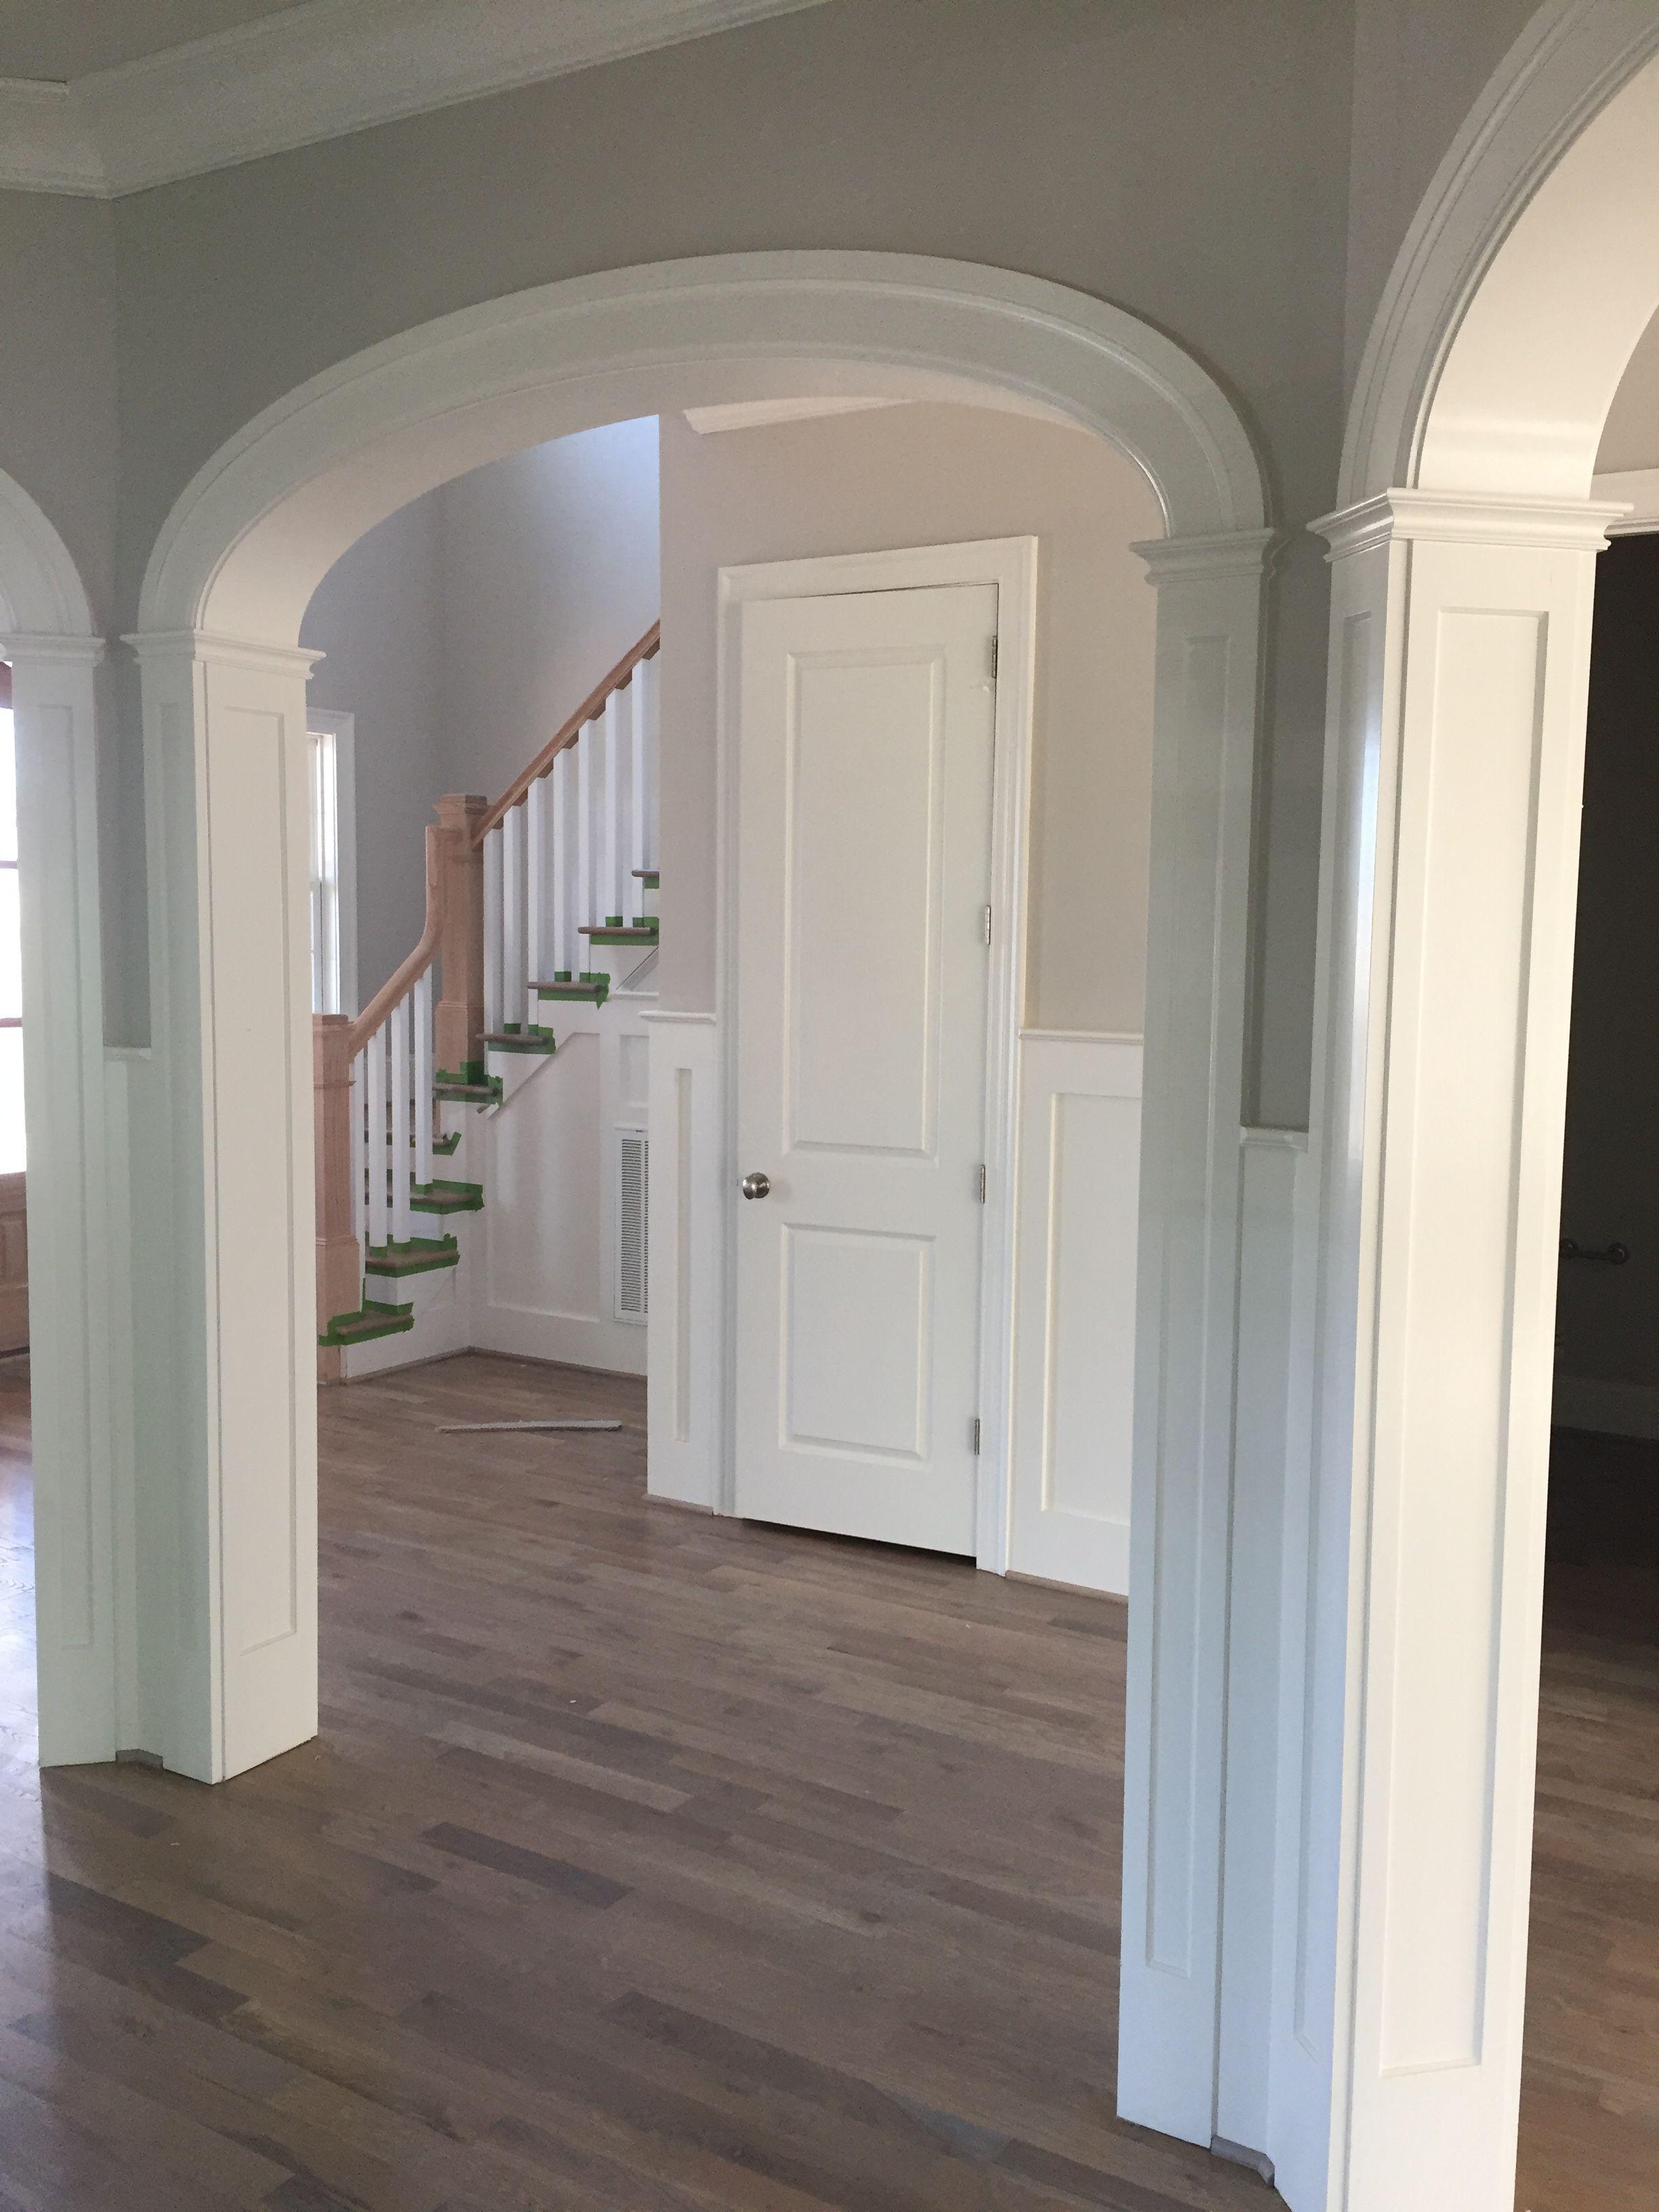 Panel Columns Underneath An Elliptical Arch Doorway Archway Molding Arch Doorway Moldings And Trim